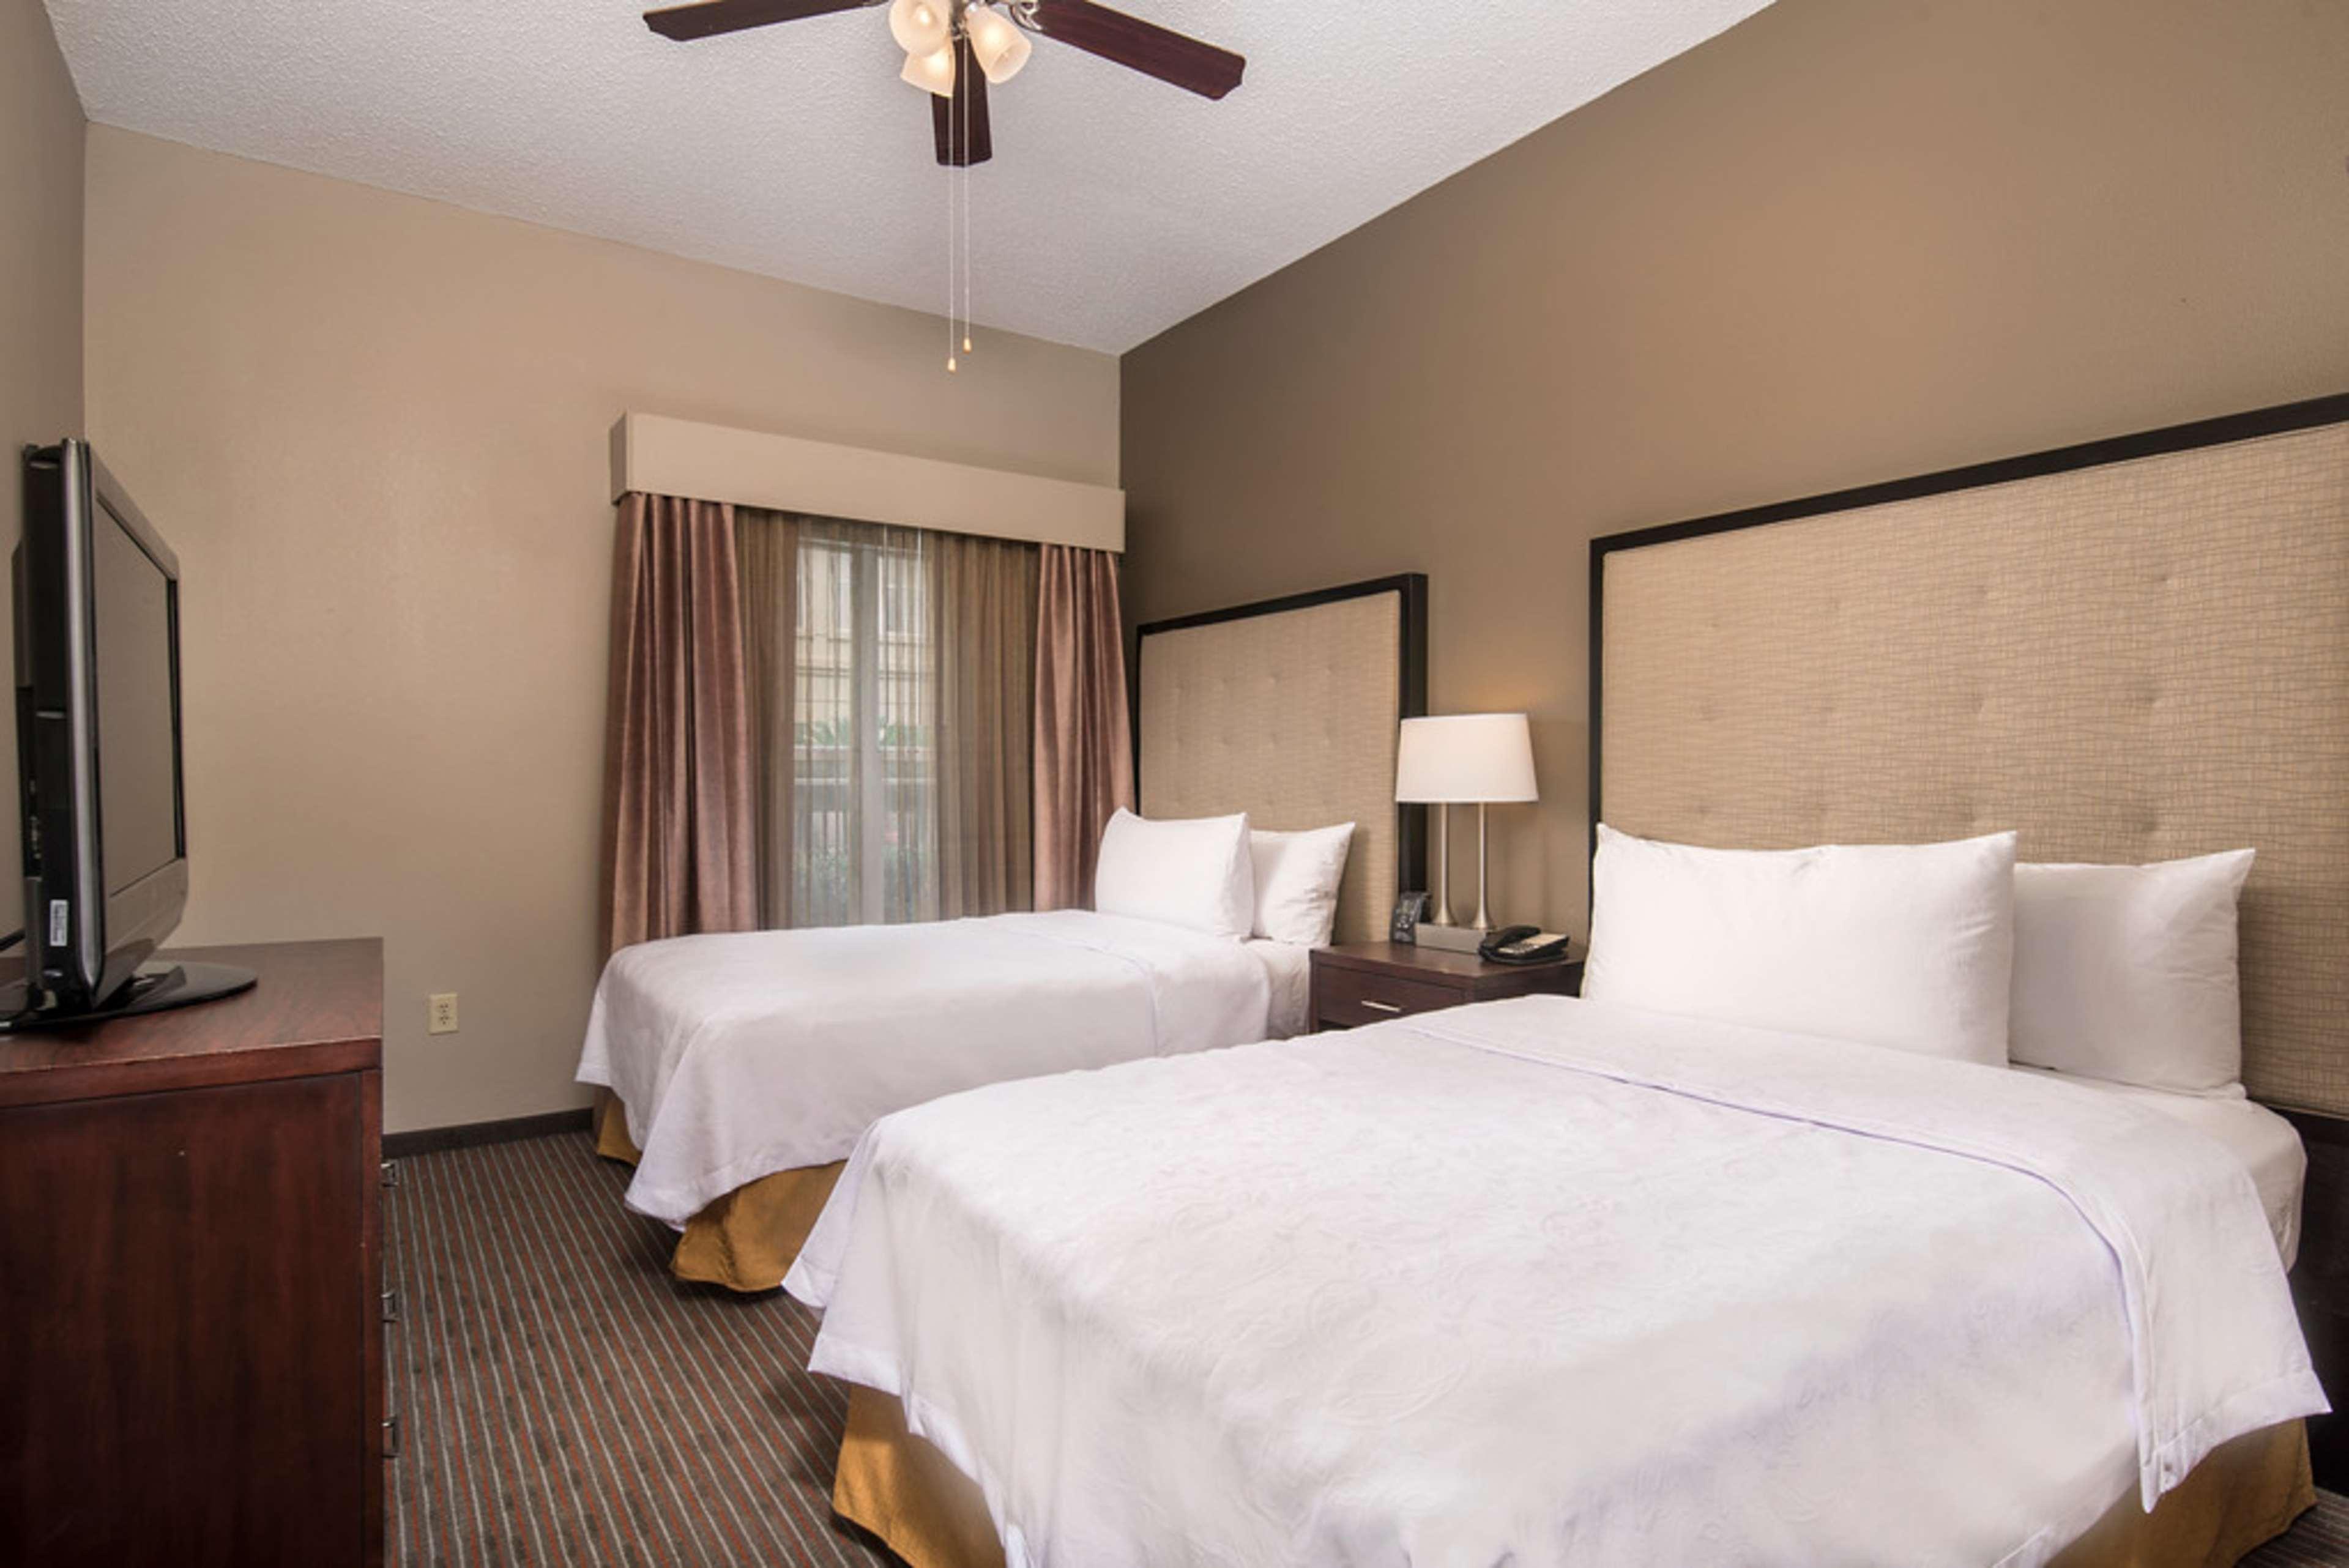 Homewood Suites by Hilton Austin-South/Airport image 10